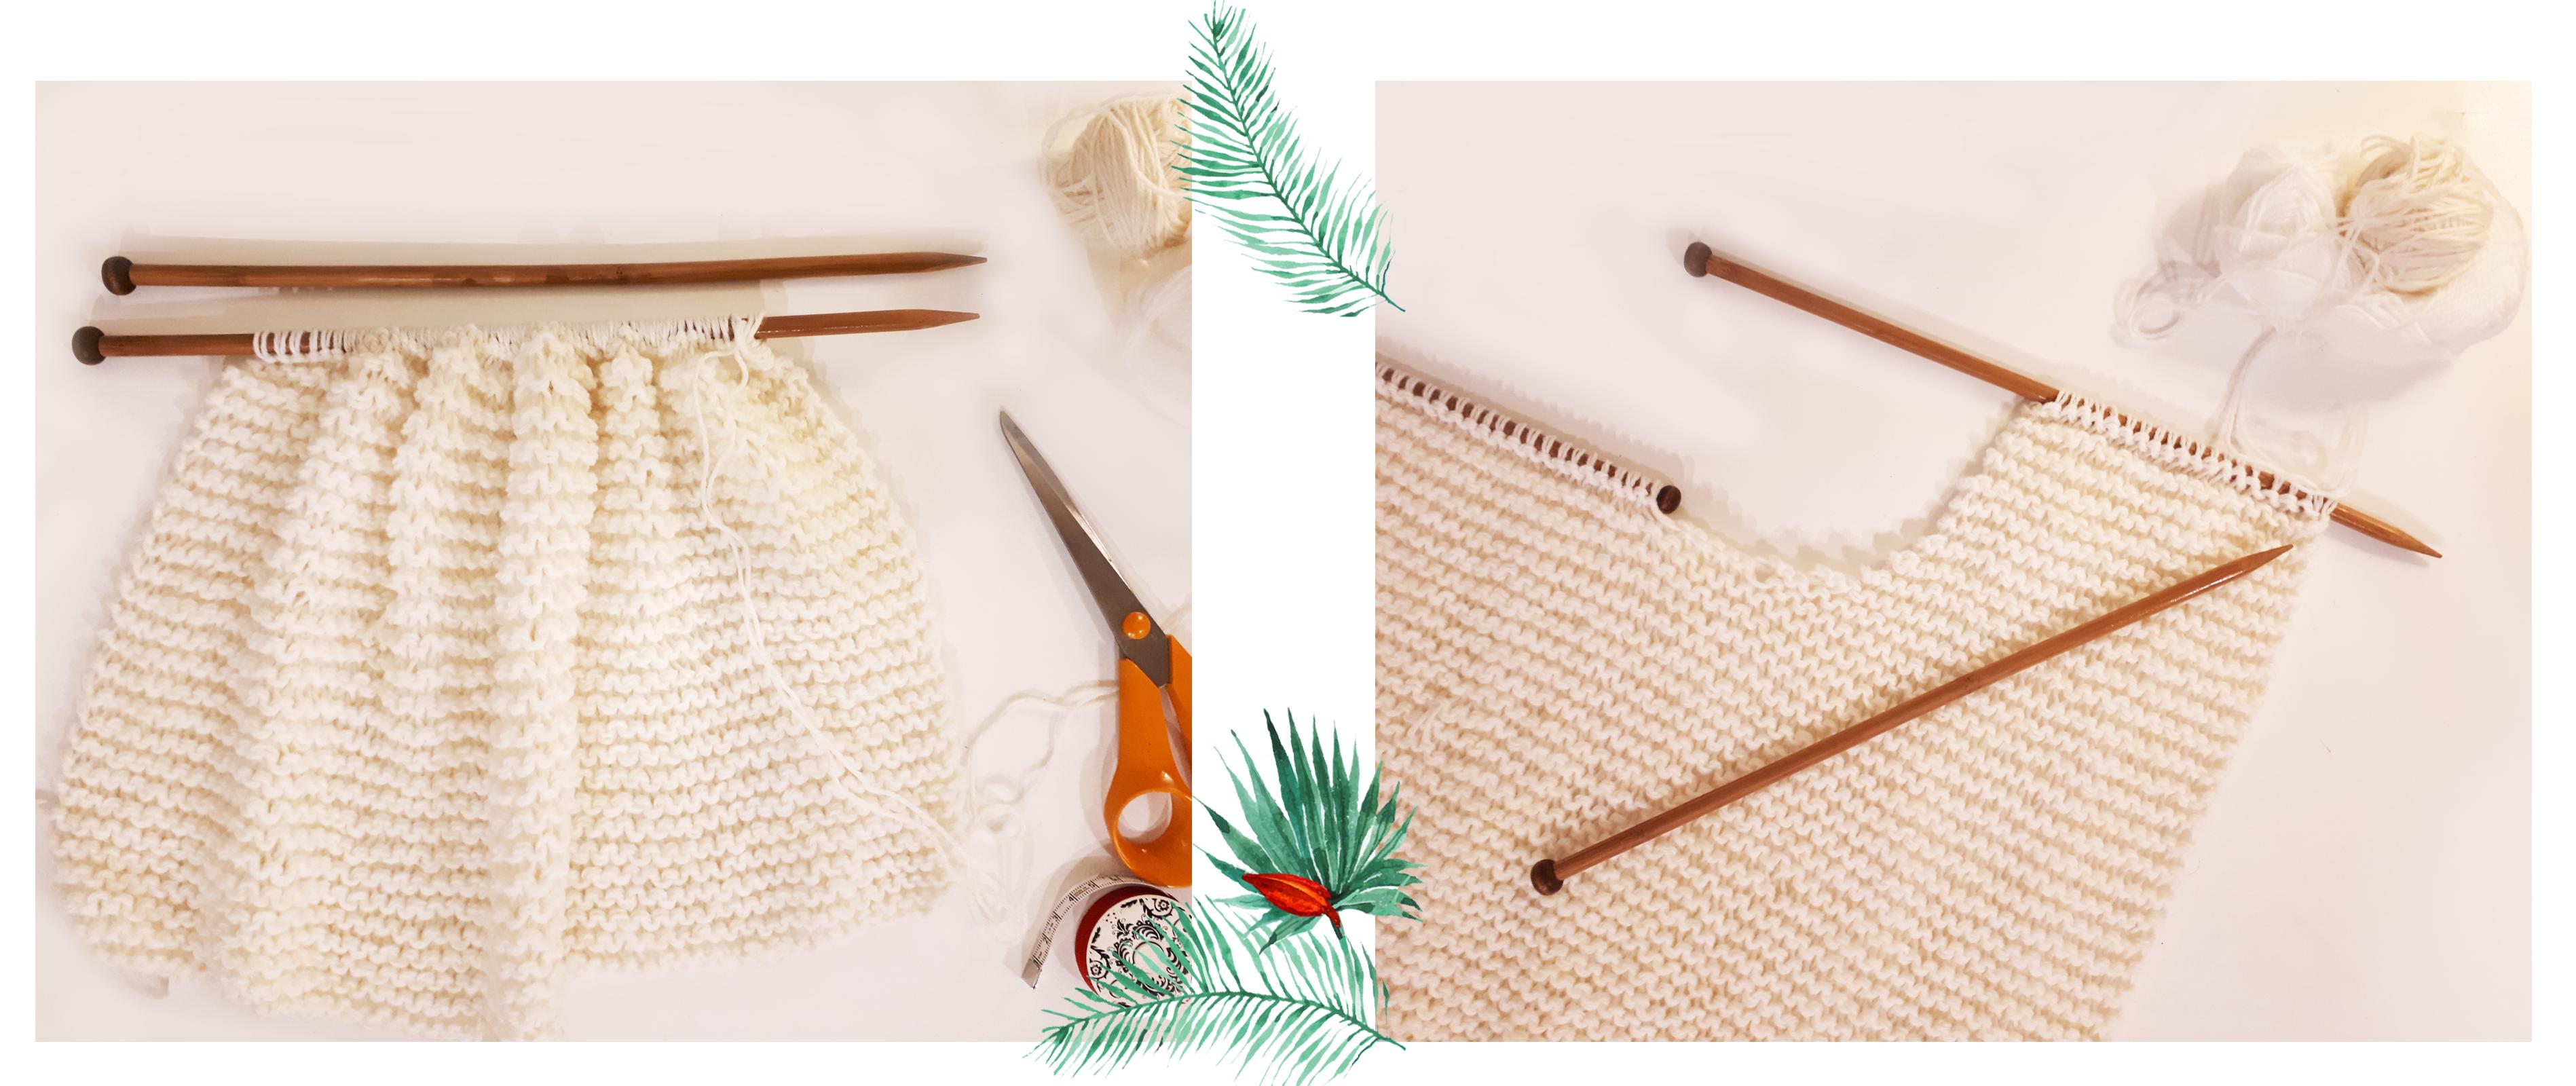 DIY-pull-tricot-laine-etape-3-4